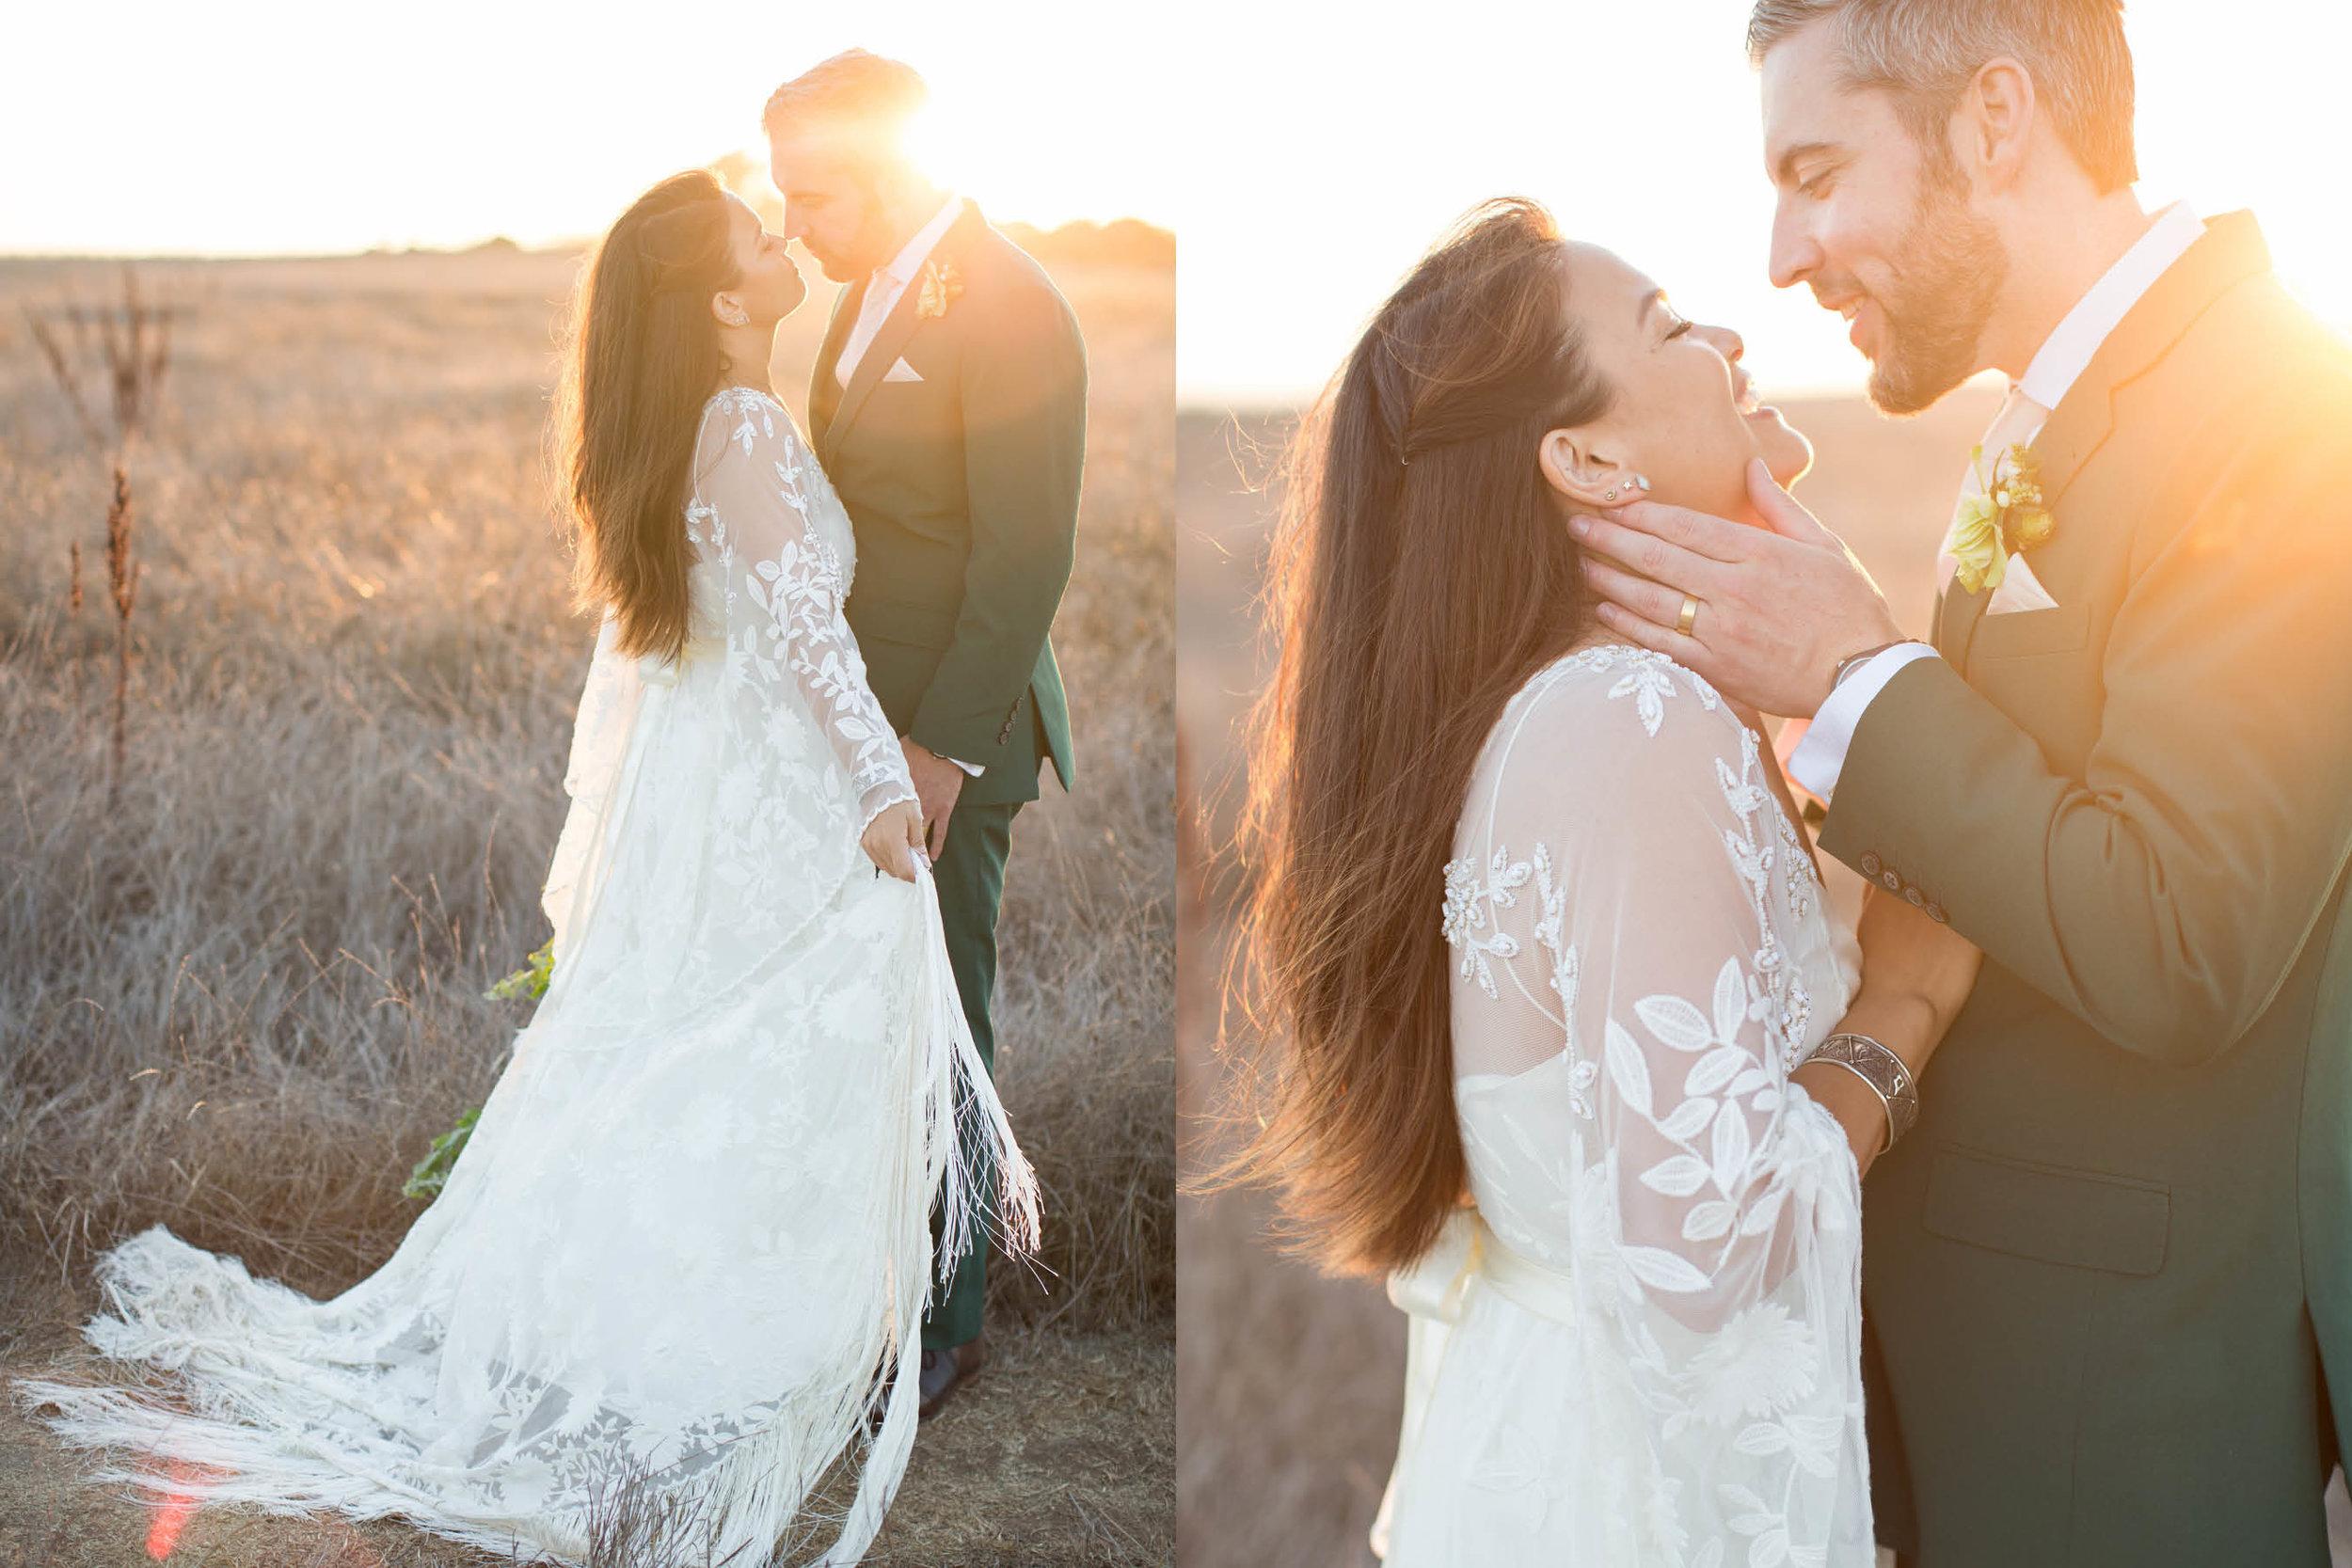 santa-barbara-elopement-elope-wedding-pop-up-coordinator-day-of-event-planning-planner-ellwood-bluff-eucalyptus-grove-rustic-ocean-view-front-hop-green-suit (1 (28).jpg